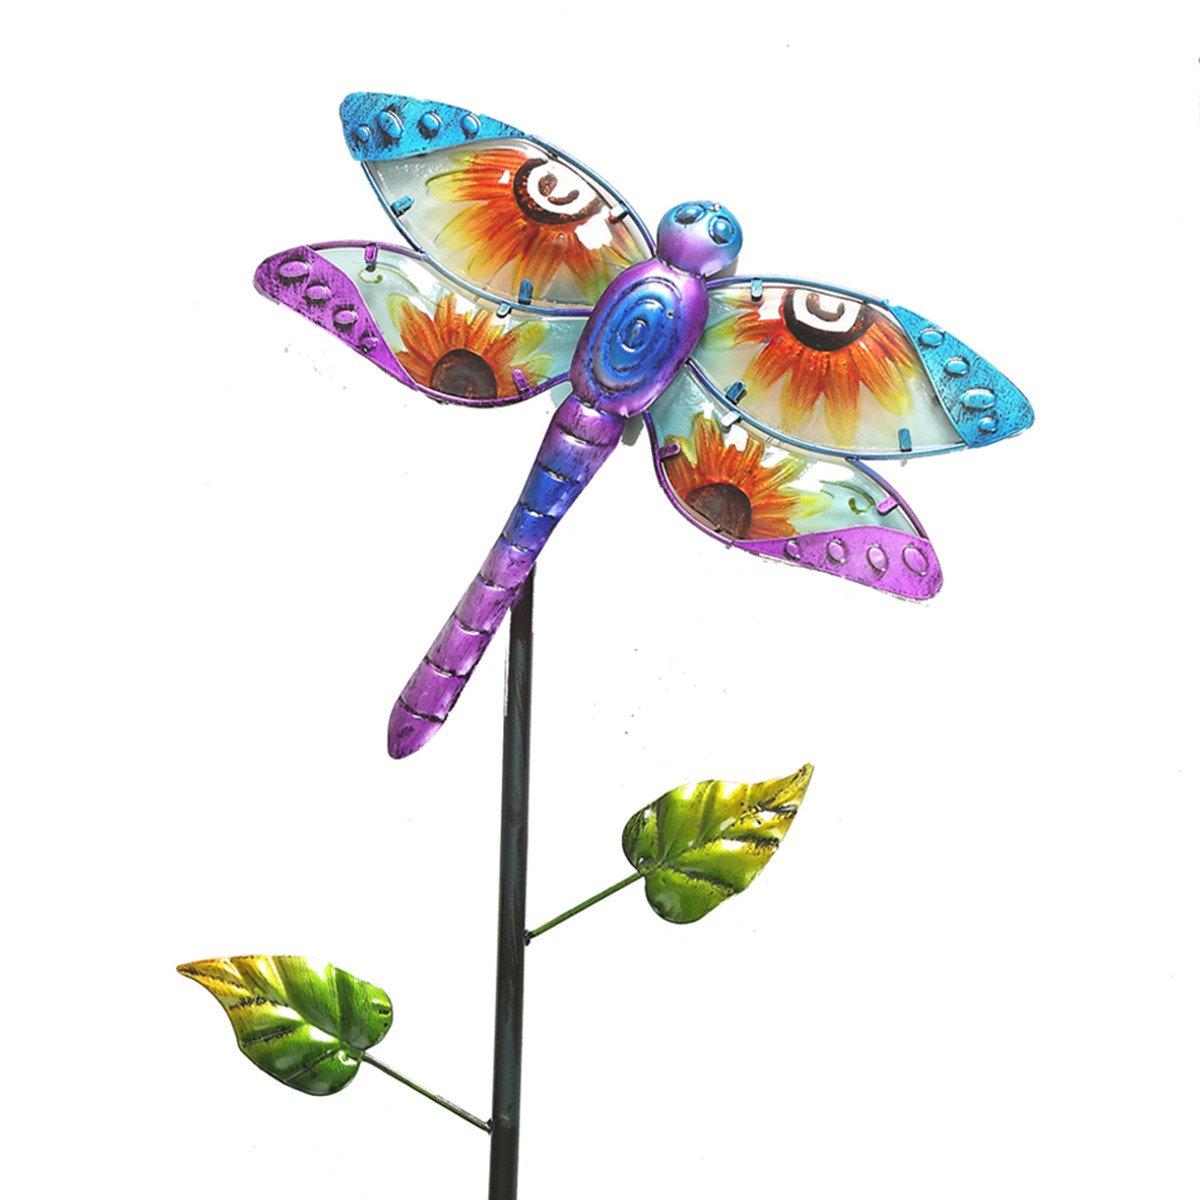 CEDAR HOME Solar Garden Stake Outdoor Figurine LED Light Cute Metal Stick Art Ornament Decor for Lawn Yard Patio, 11'' W x 2'' D x 52'' H, Dragonfly by CEDAR HOME